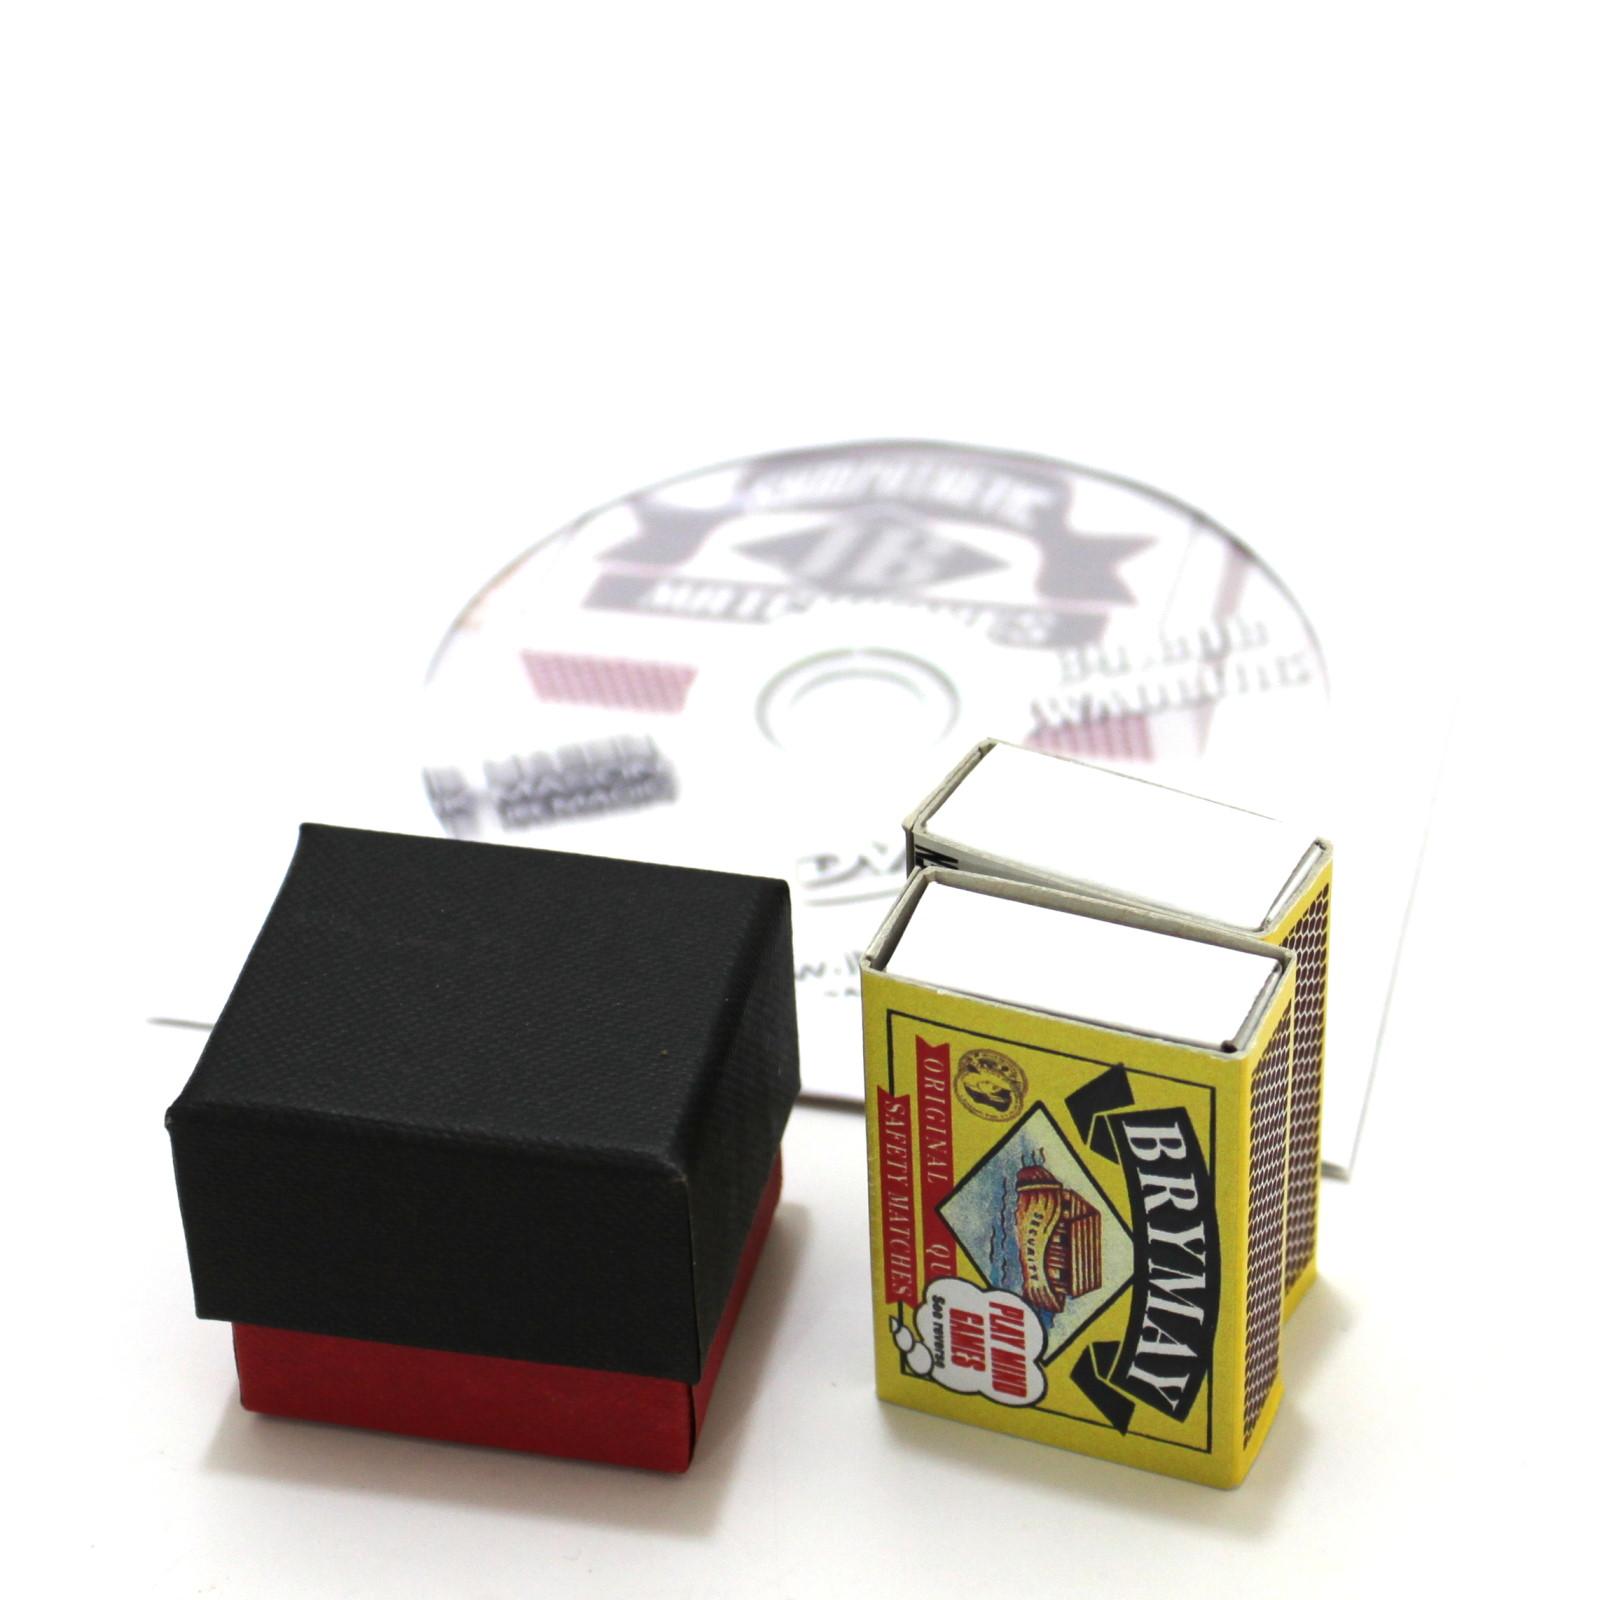 Sympathetic Matchboxes (2014) by Bob Swadling